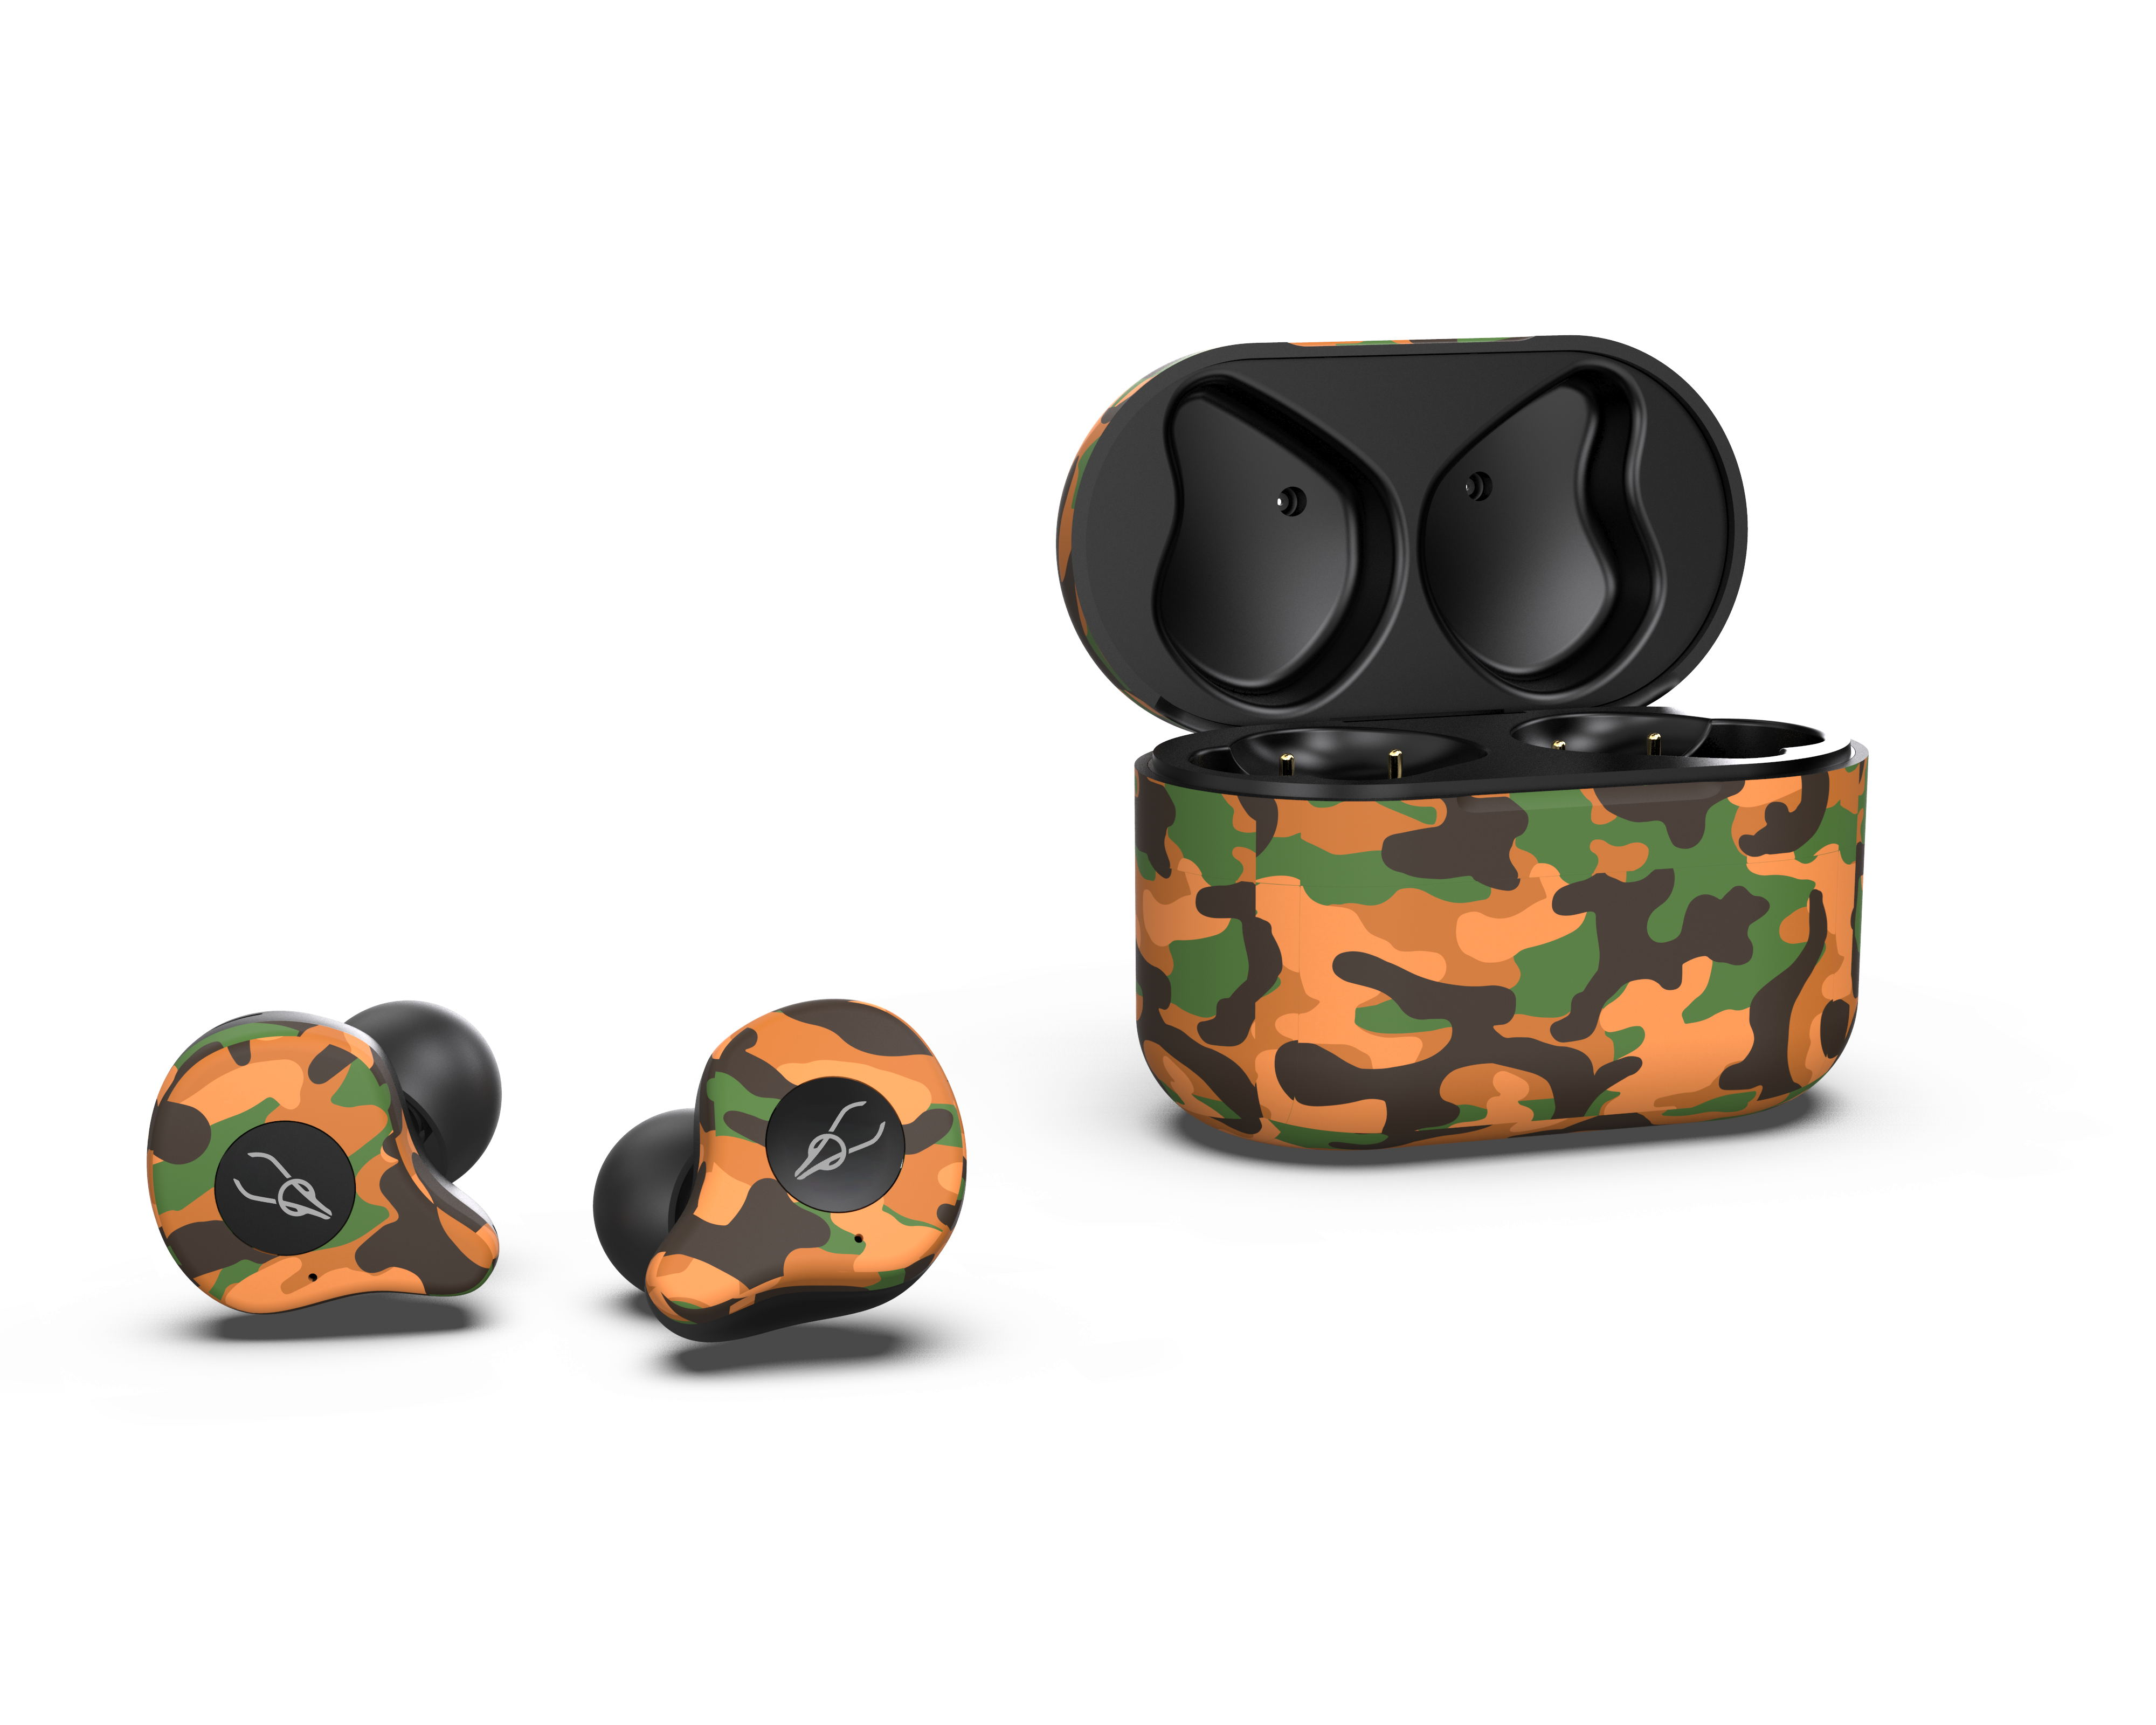 Sabbat E12 Ultra Camouflage TWS Bluetooth 5.0 Earphone Stereo Wireless Sport Earbuds Sahara